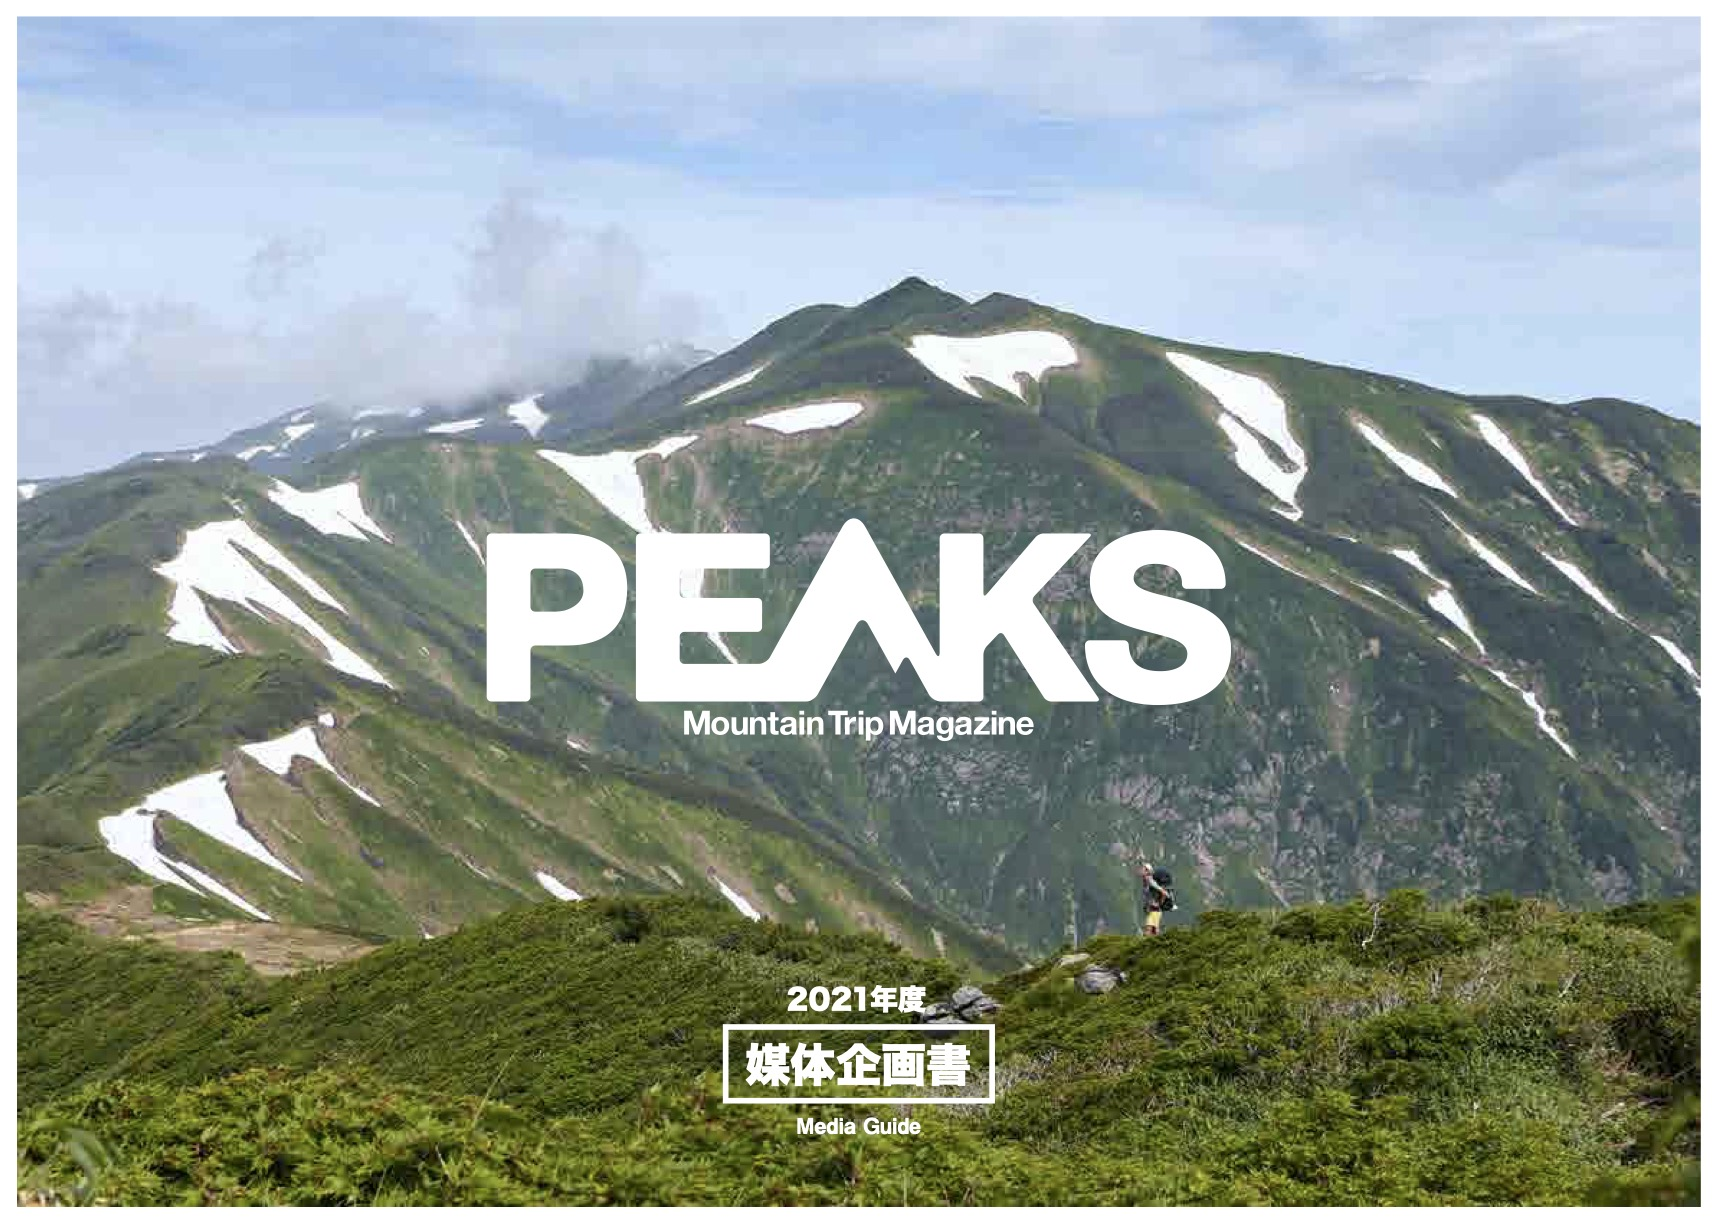 PEAKS_MediaGuide2021